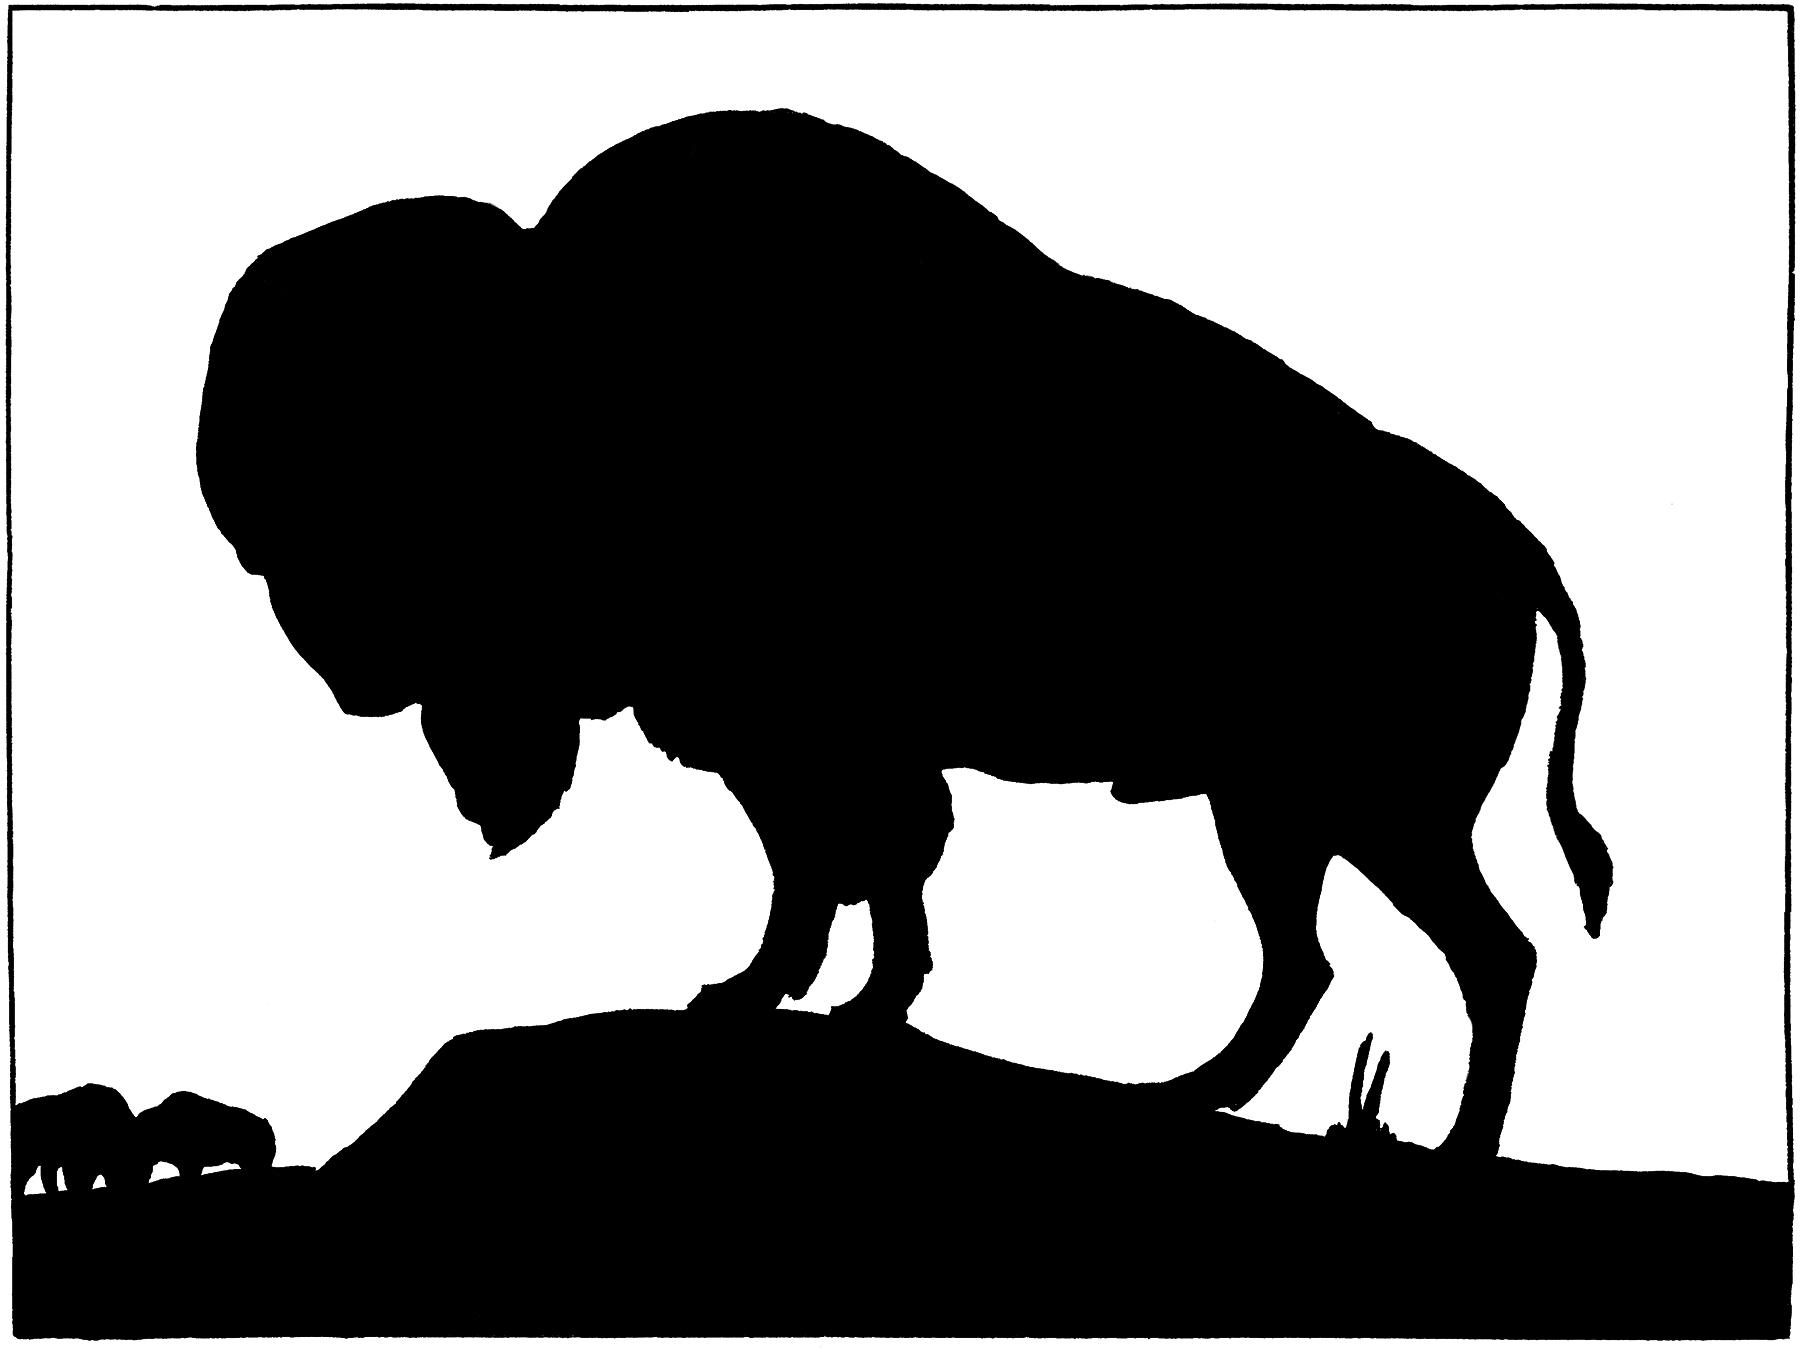 Vintage Buffalo Silhouette Image! - The Graphics Fairy